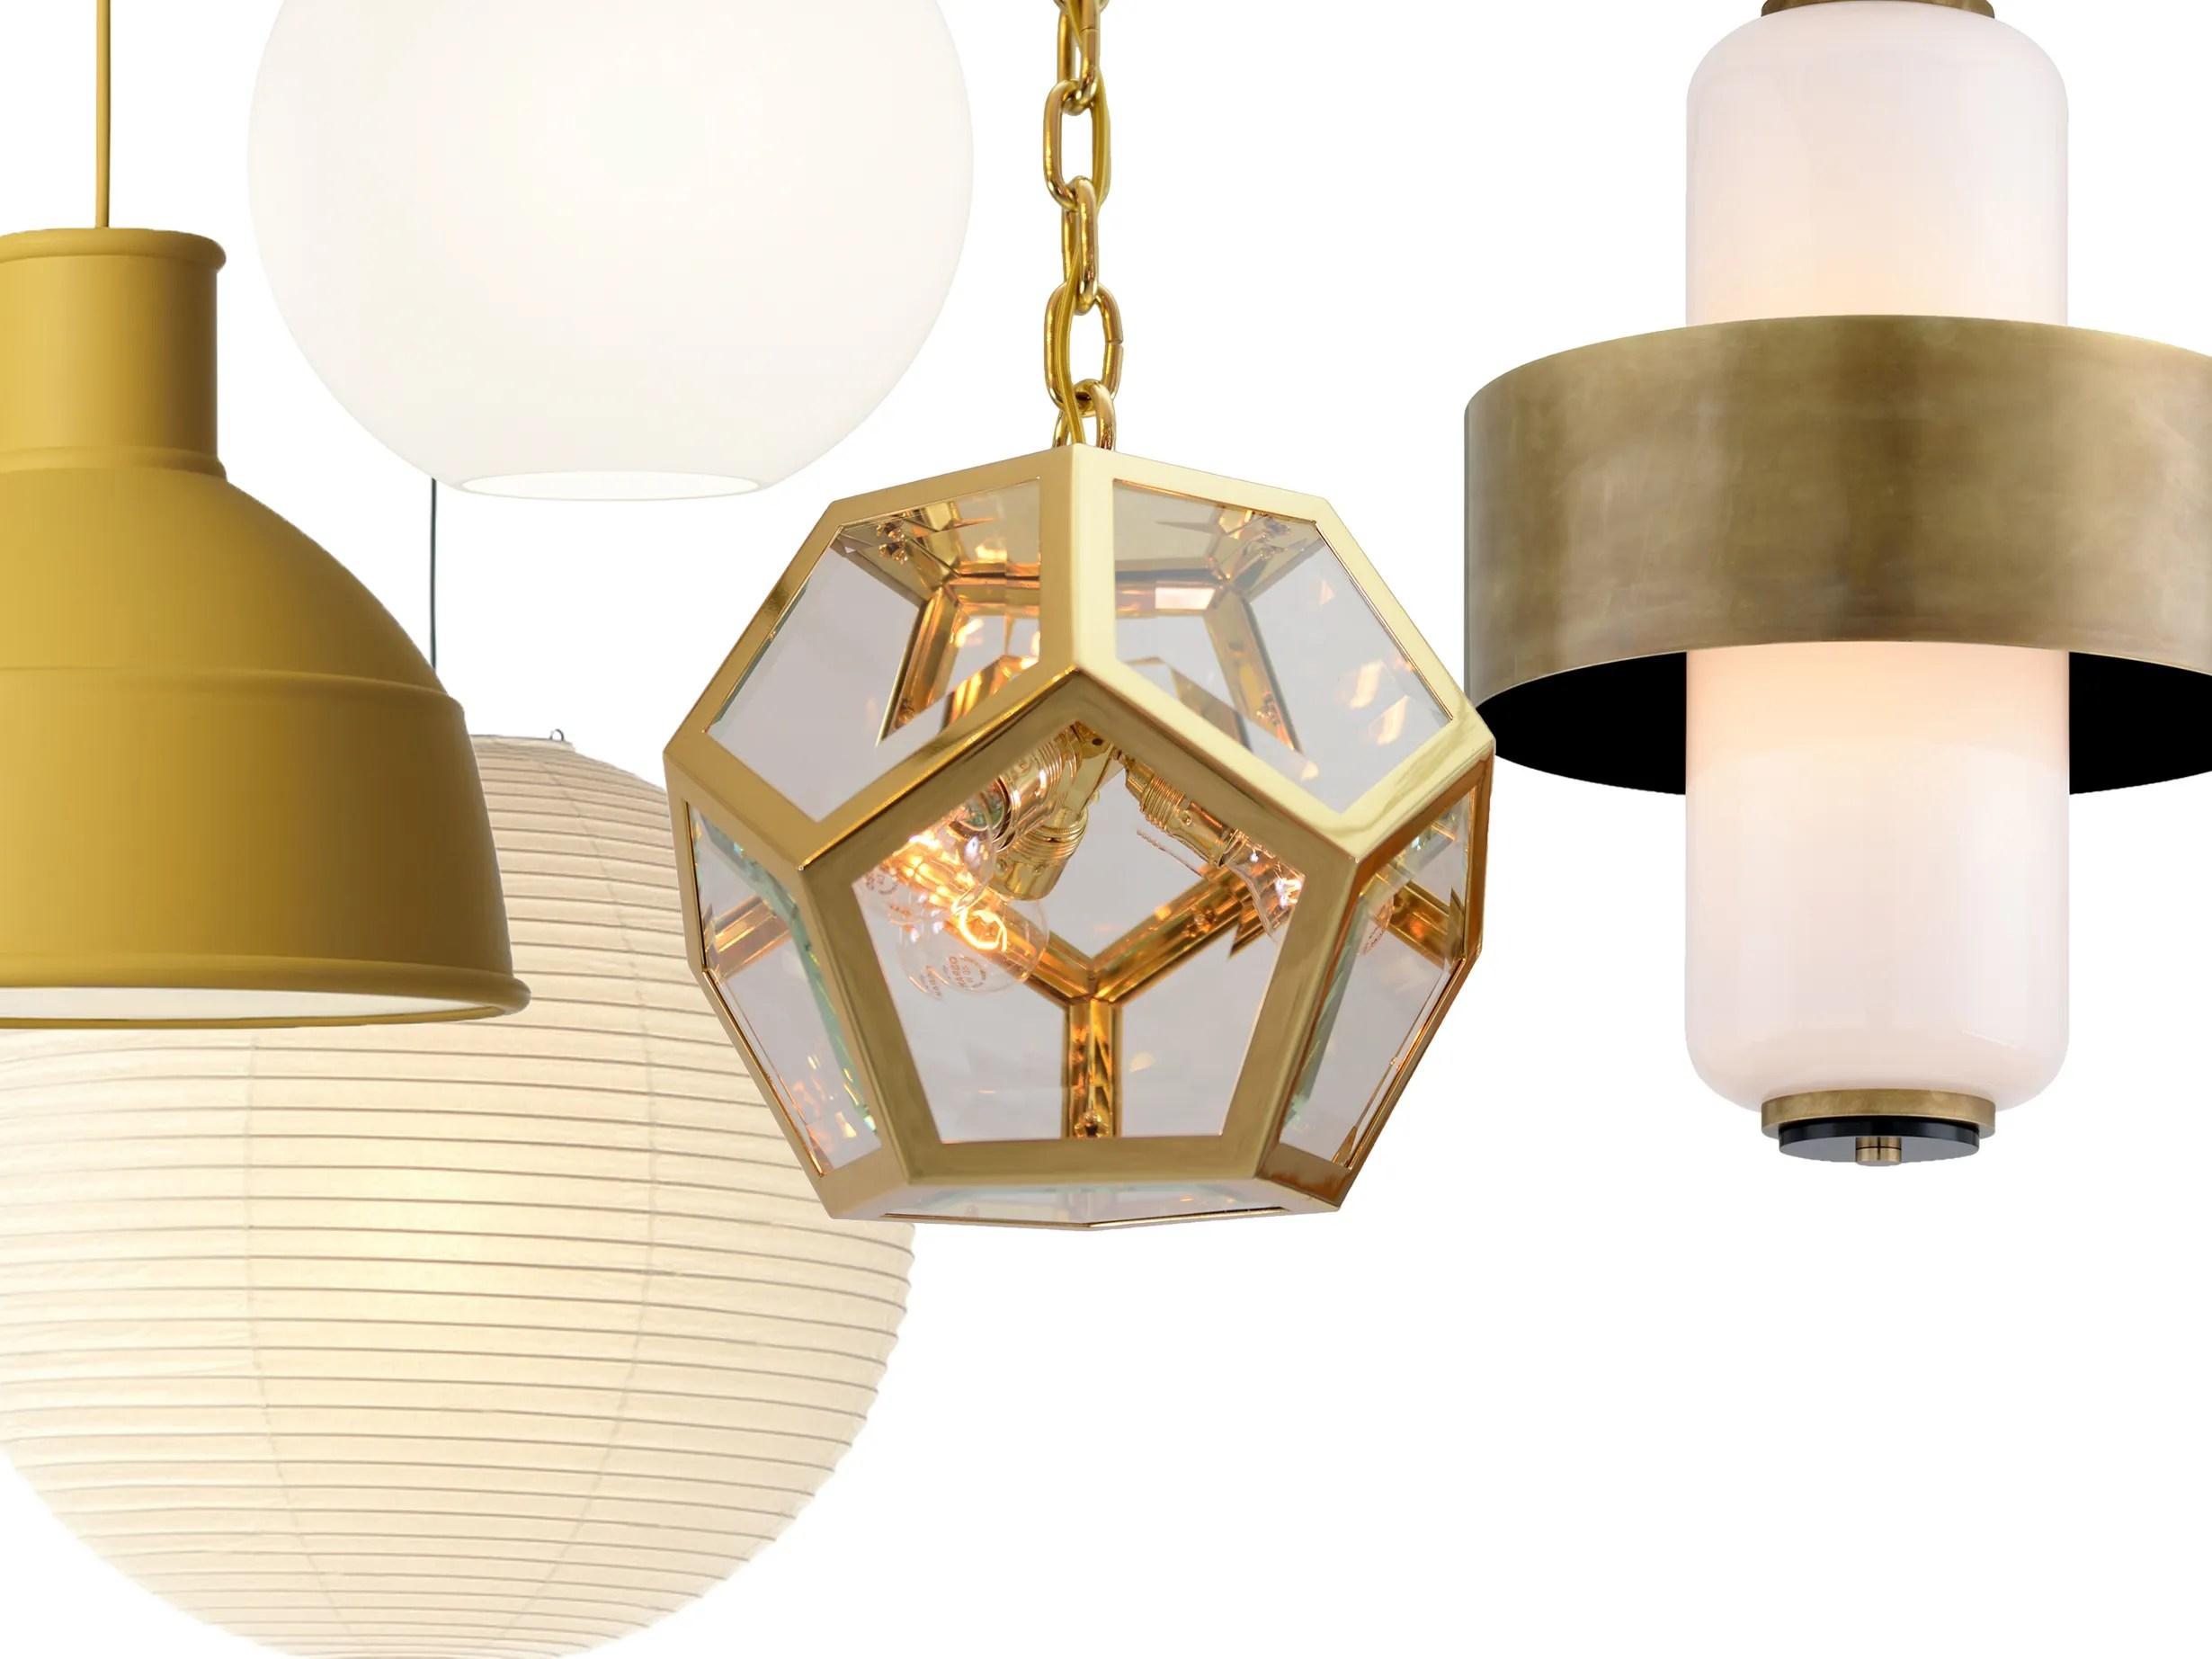 14 pendant light fixtures that ad s